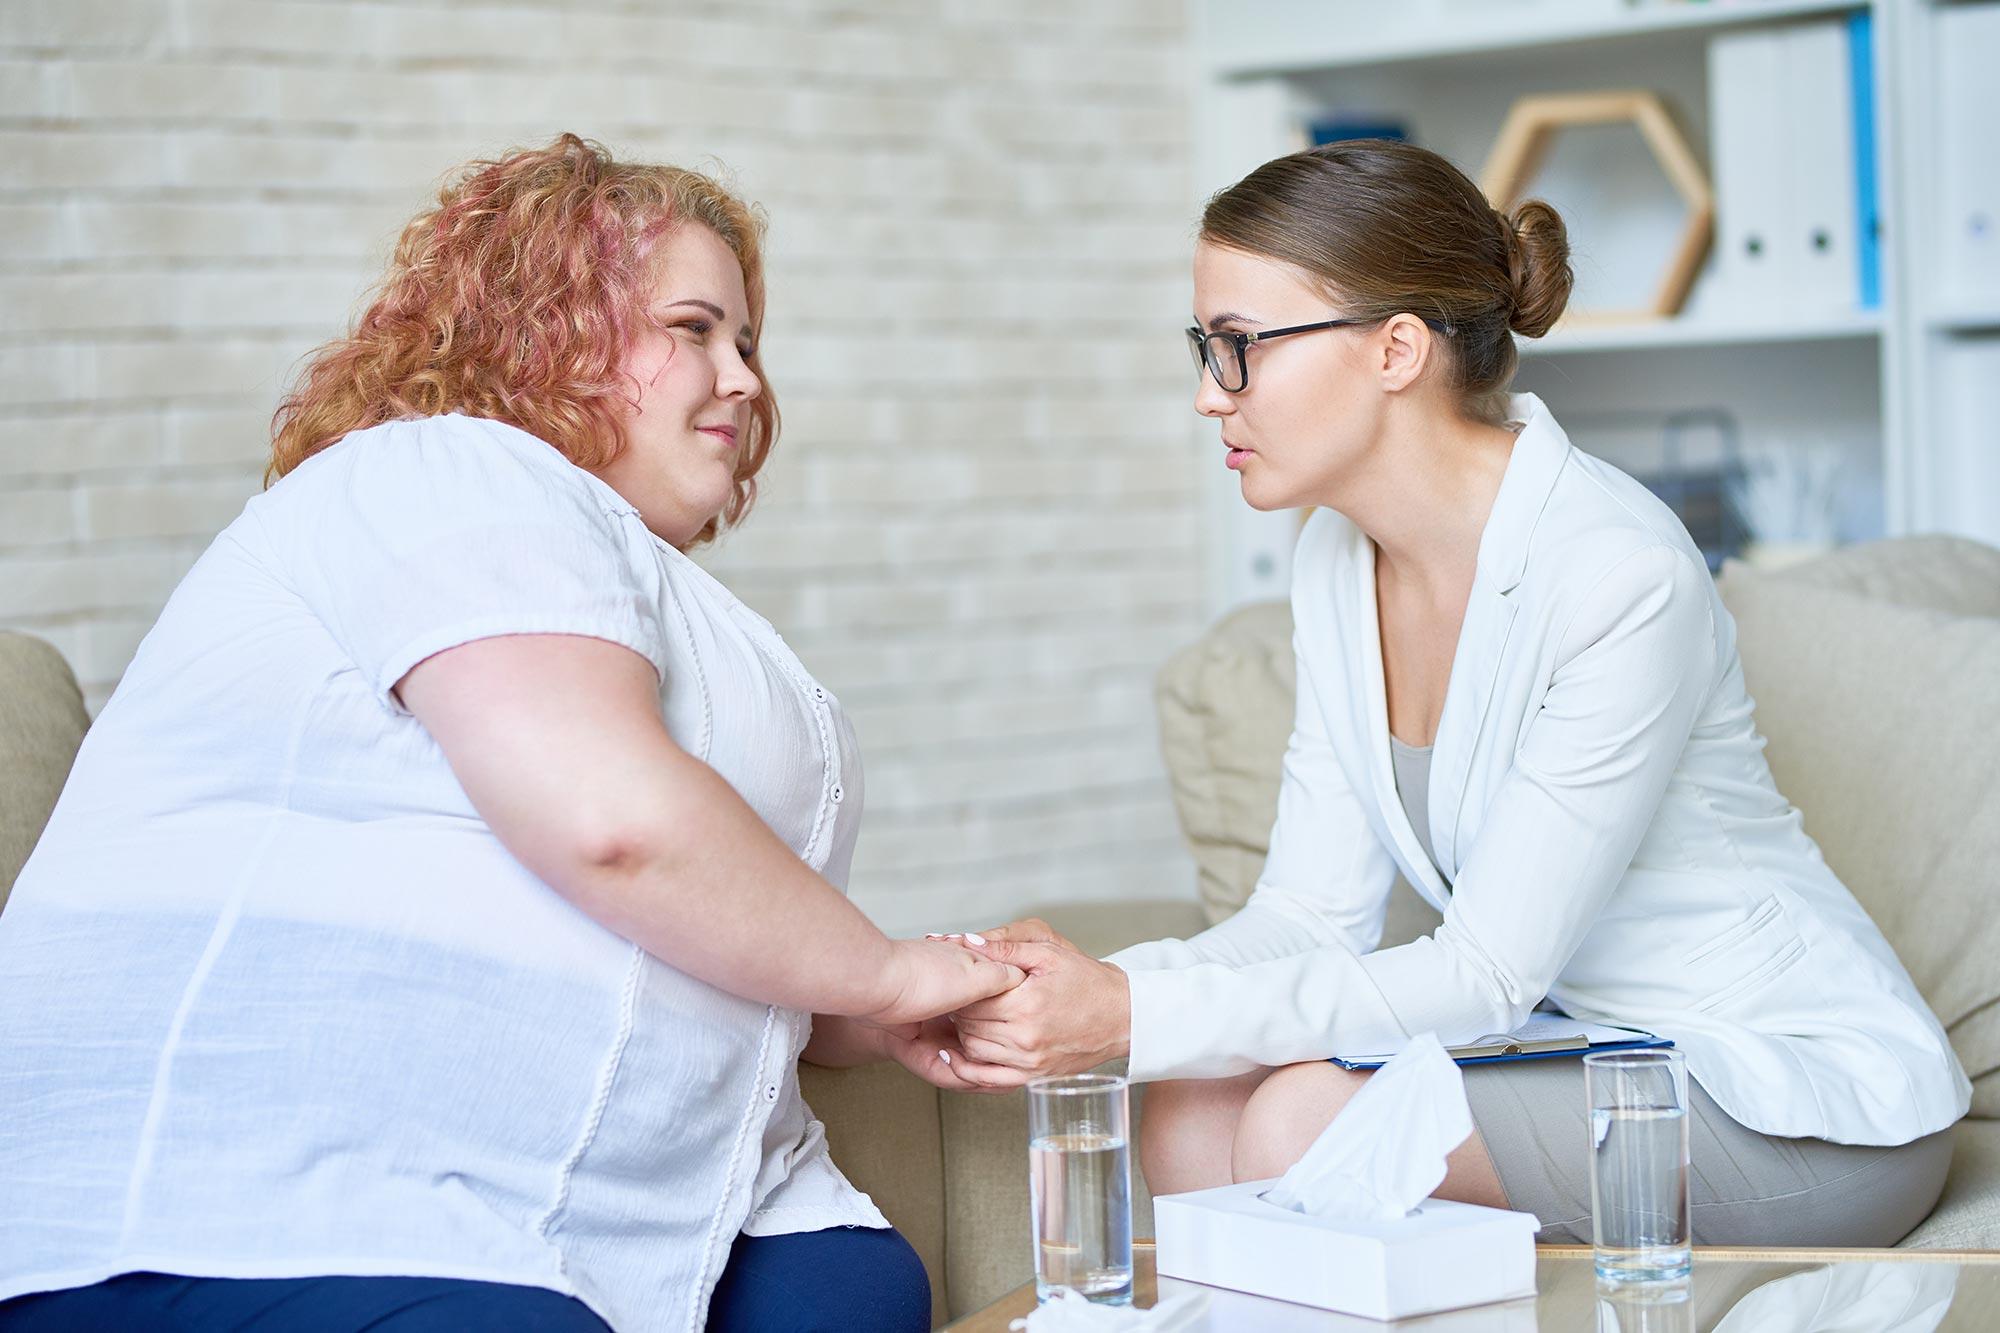 Лечение ожирения в Испании: методы и технологии